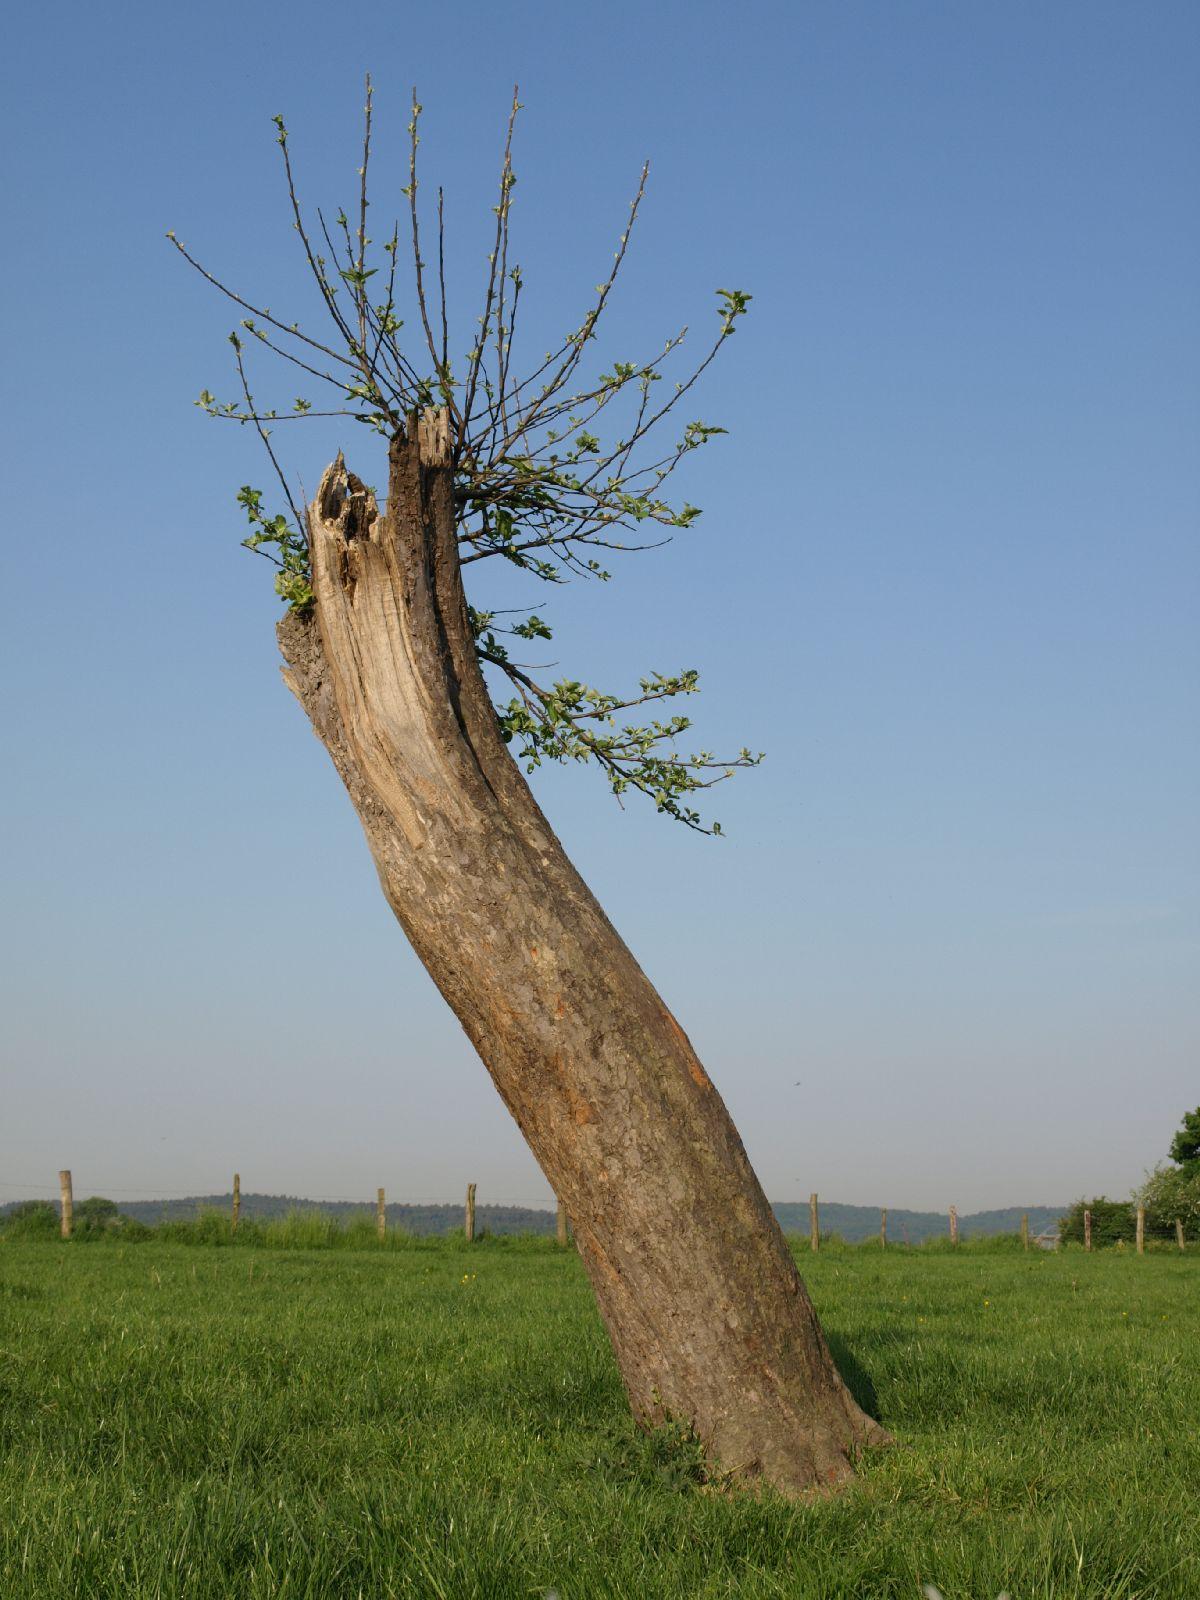 Pflanzen-Baum-Foto_Textur_B_P5142753